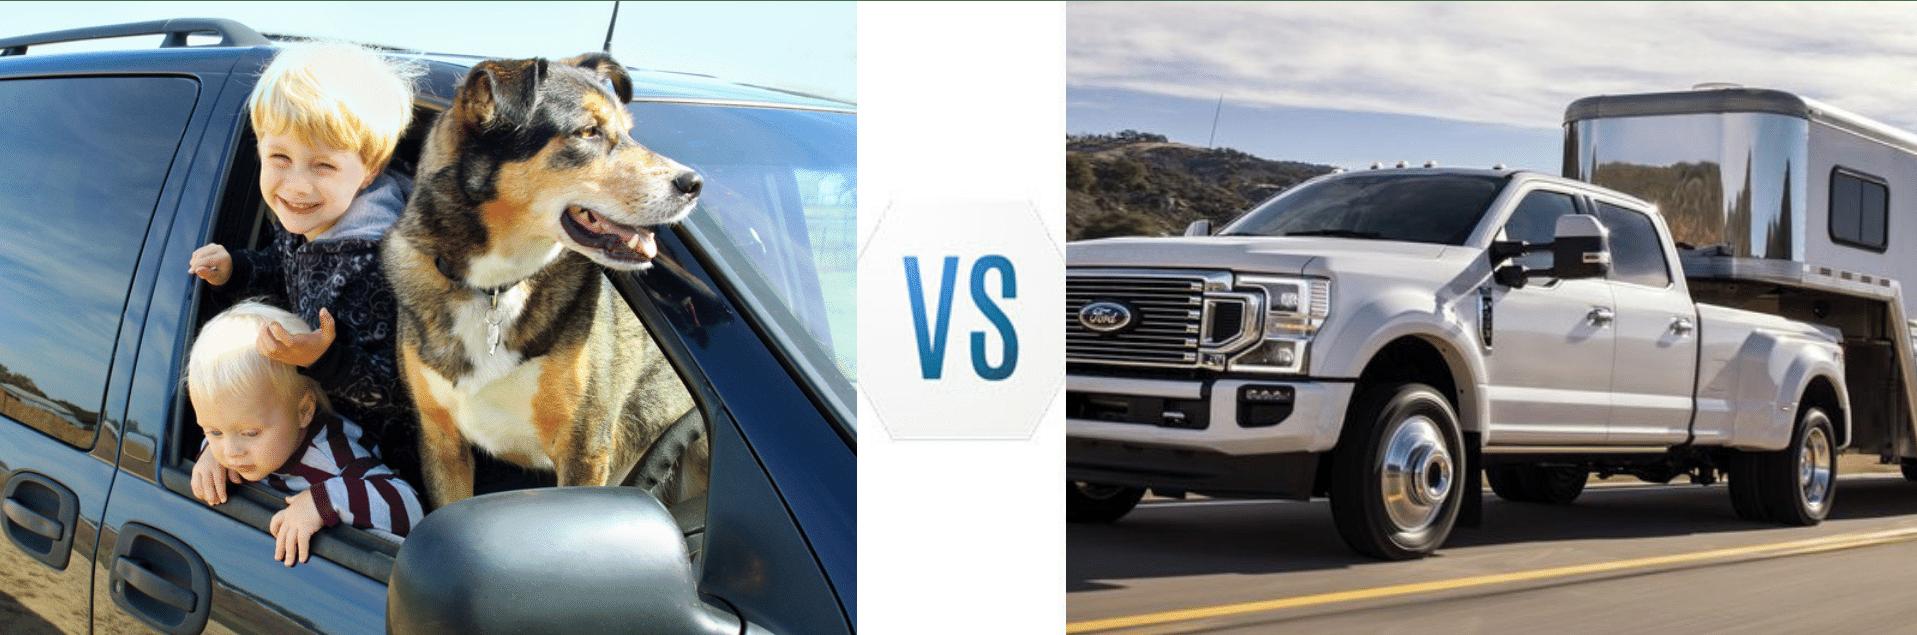 Image shows a Minivan vs. Ford Super Duty Pickup Truck Tableau